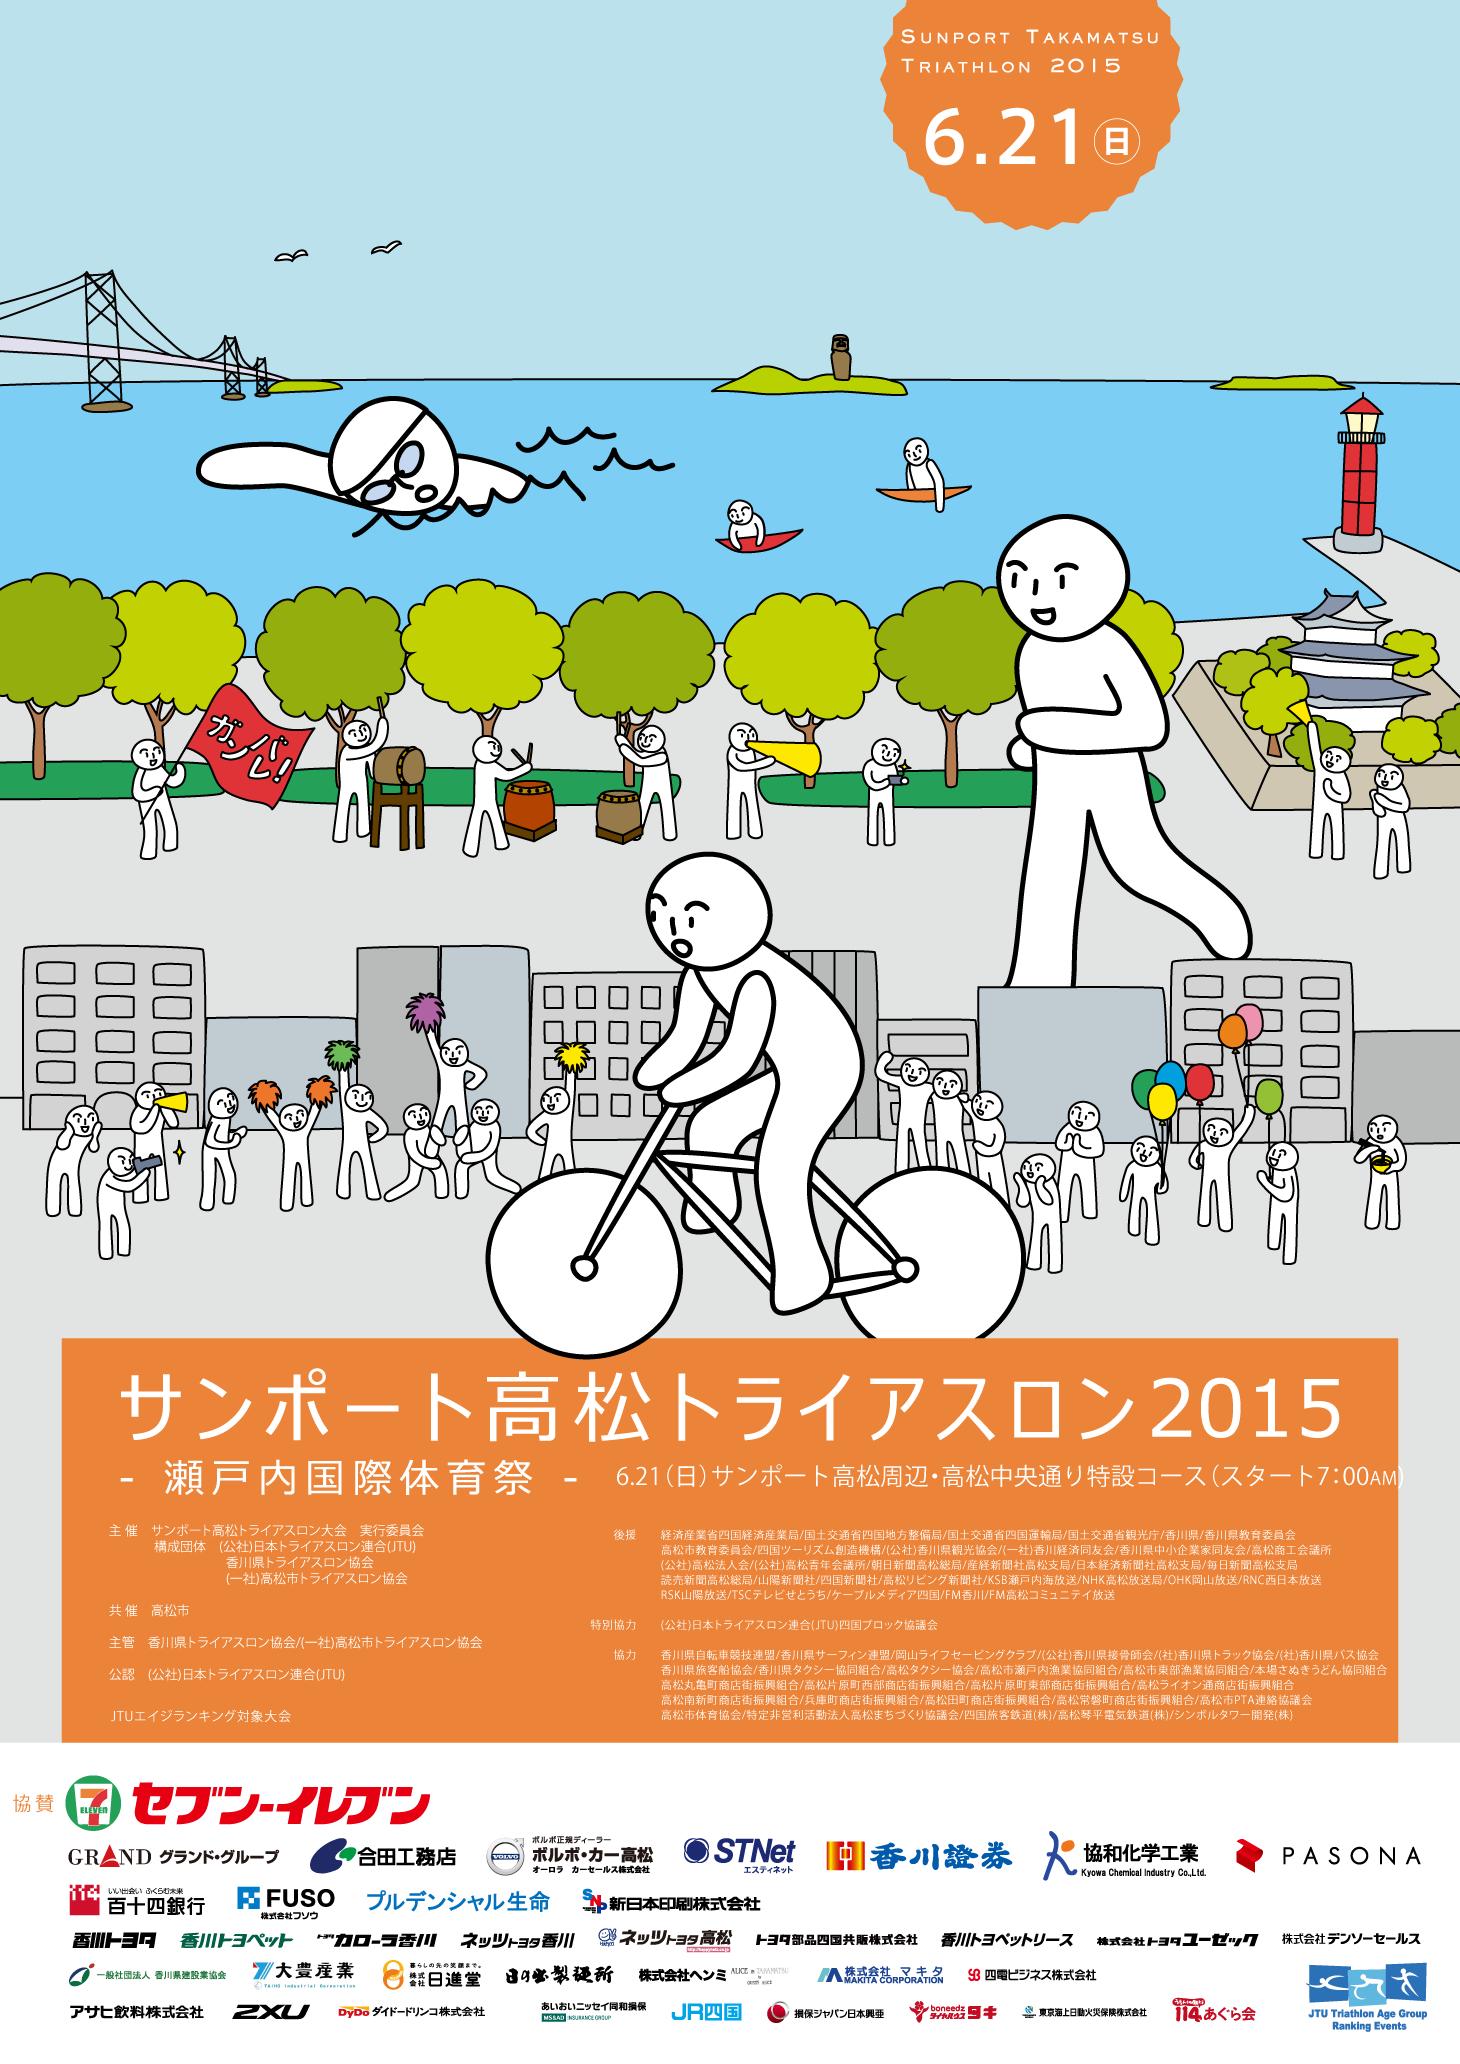 triart2015